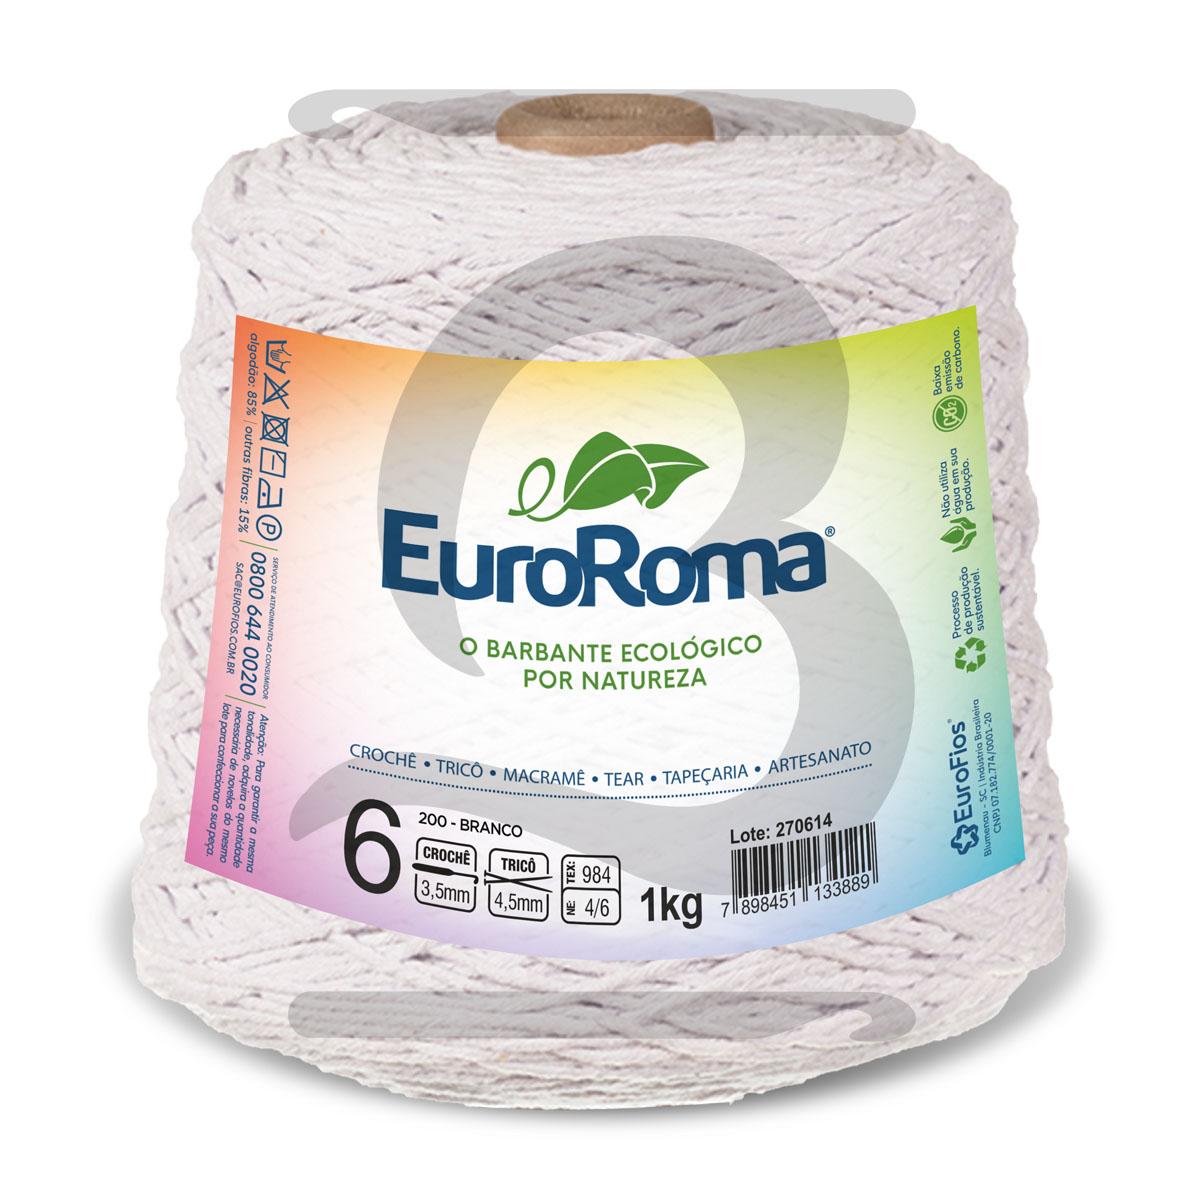 Barbante EuroRoma Colorido N°6 - 1kg Cor 200 Branco